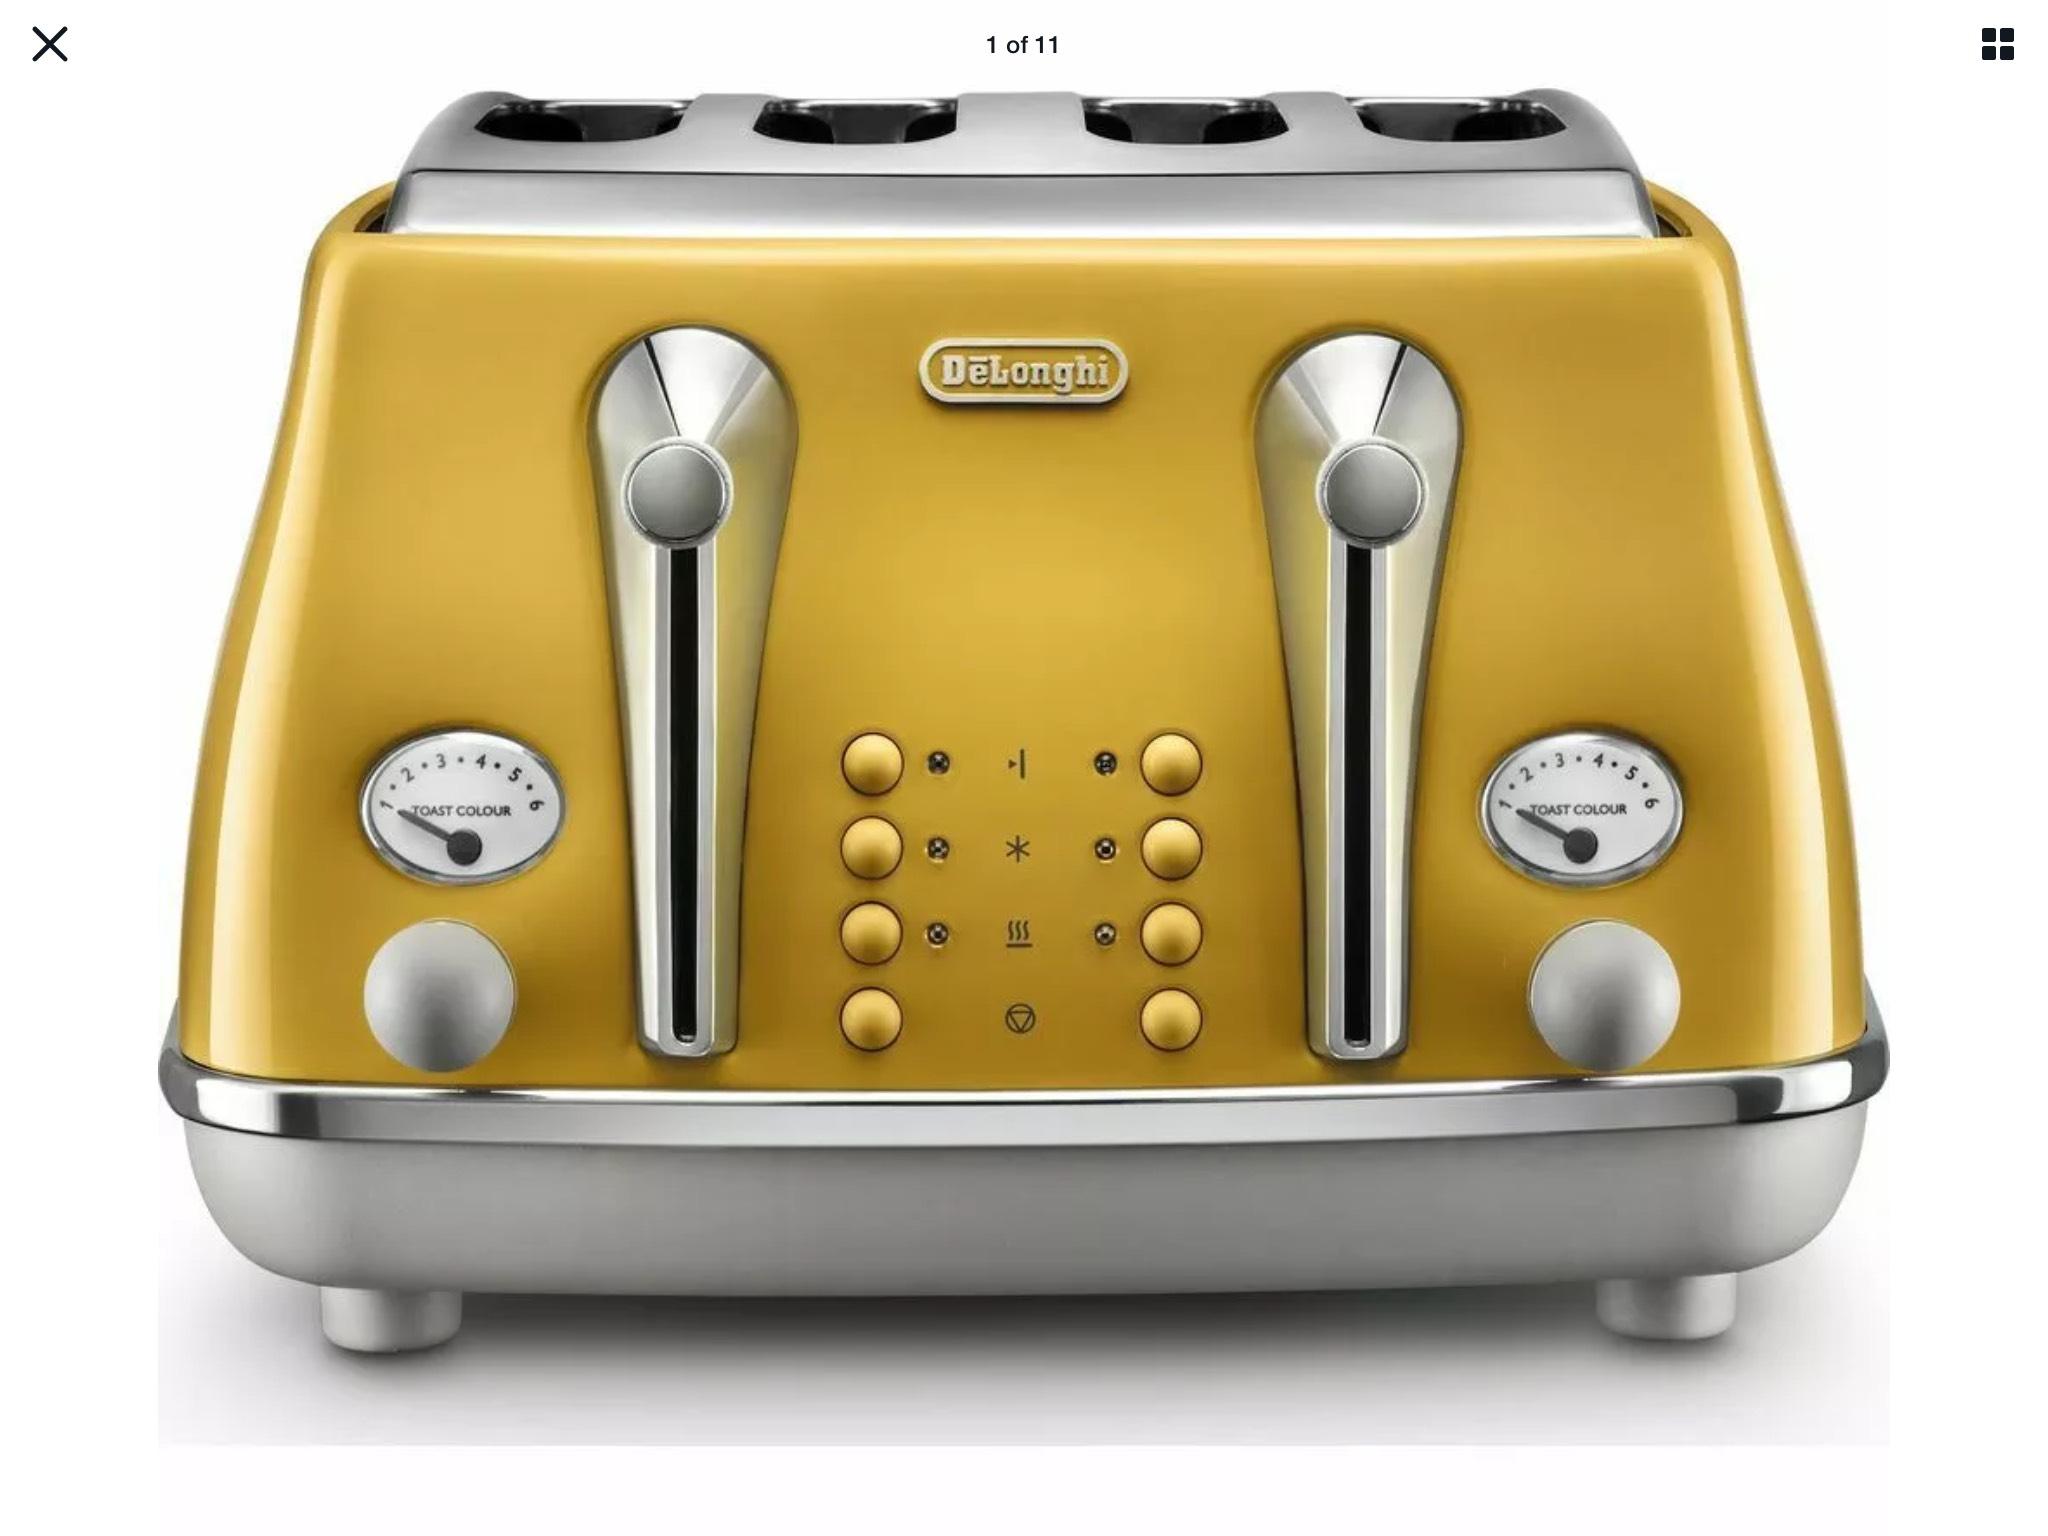 Delonghi Icona 4 slice toaster £49.99 certain colours @ Curry's ebay